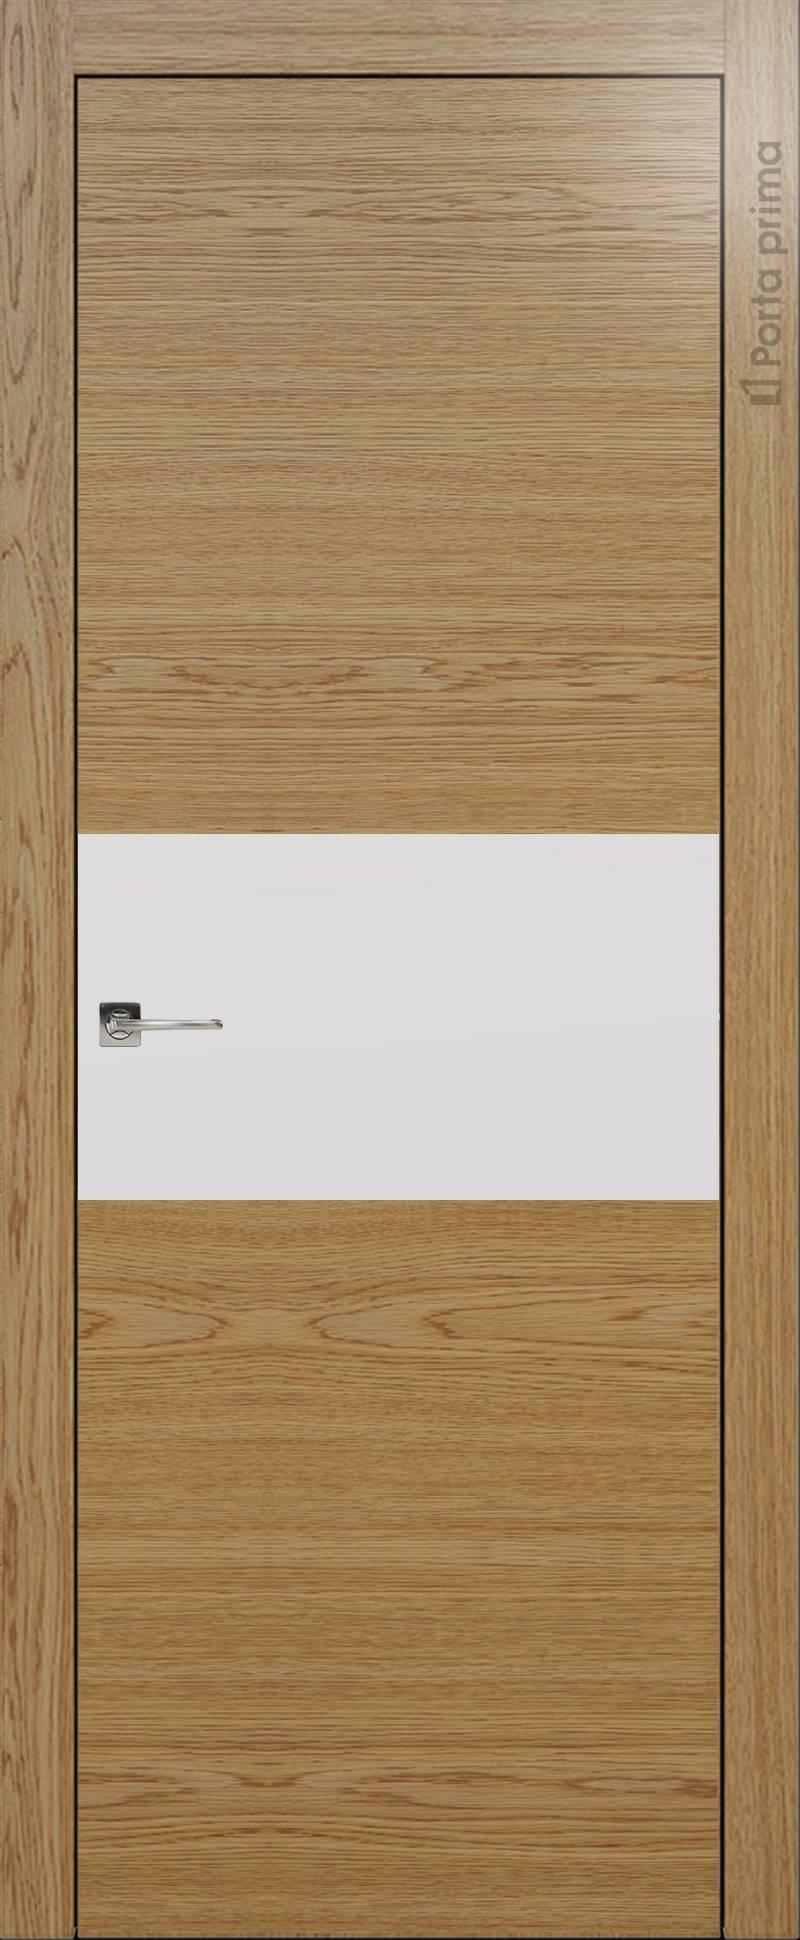 Tivoli Е-4 цвет - Дуб карамель Без стекла (ДГ)